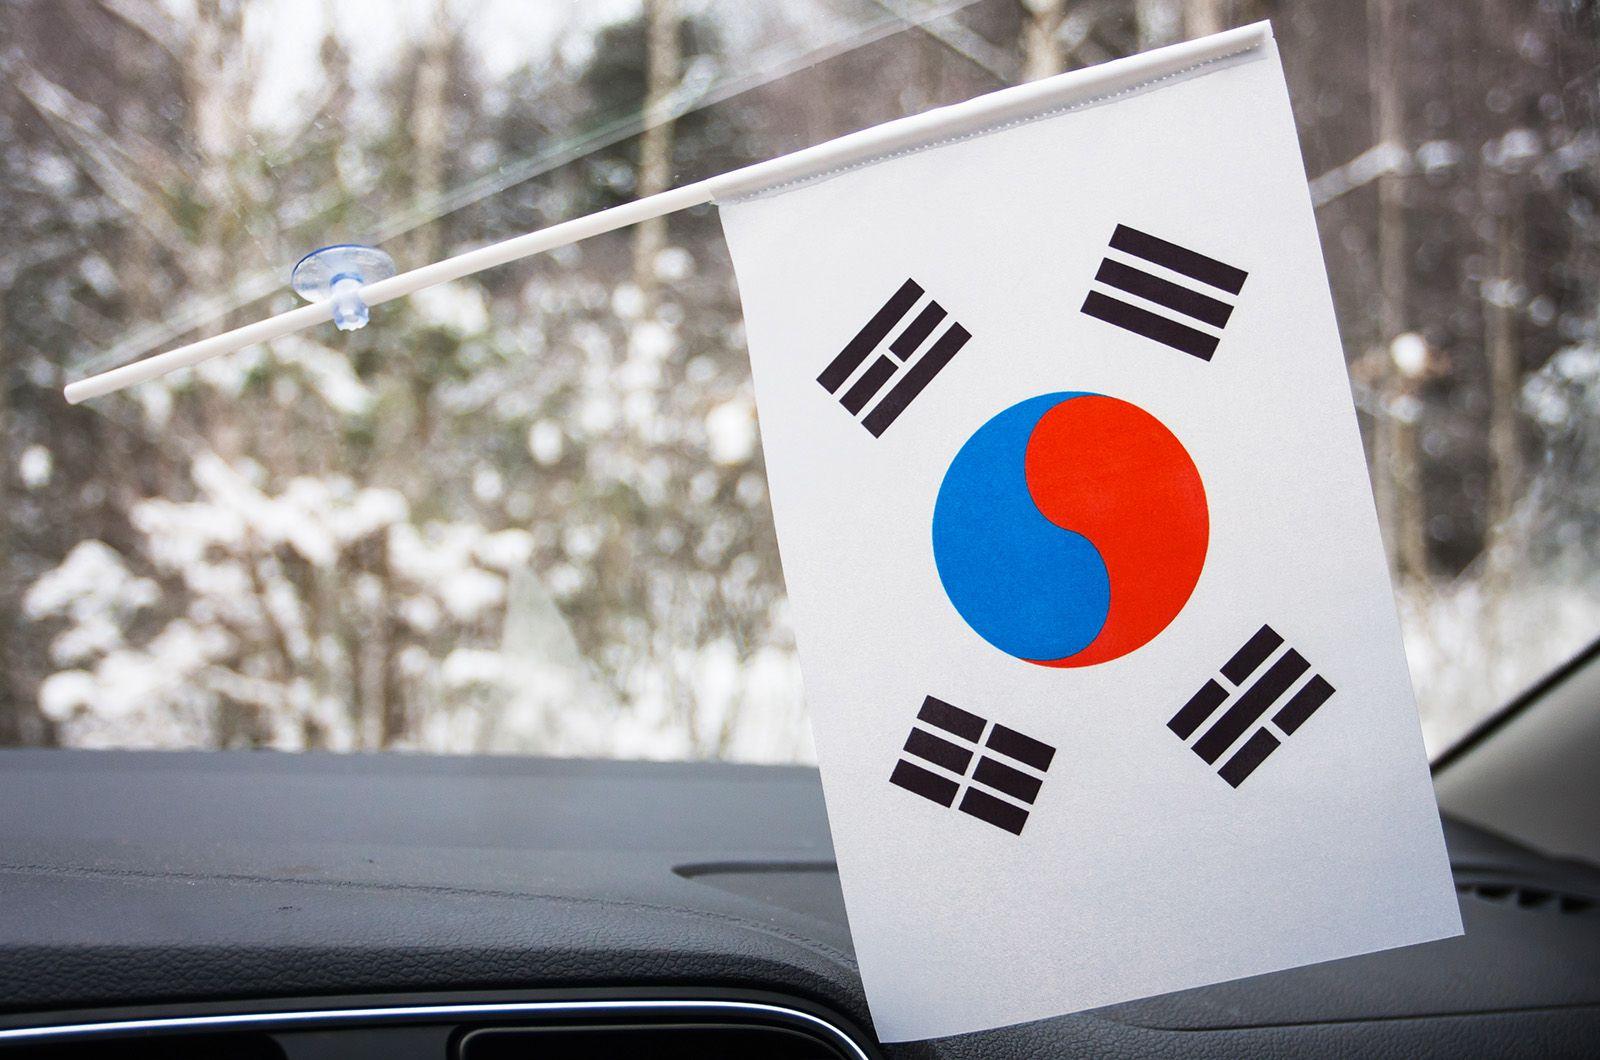 Флажок Южной Кореи в машину